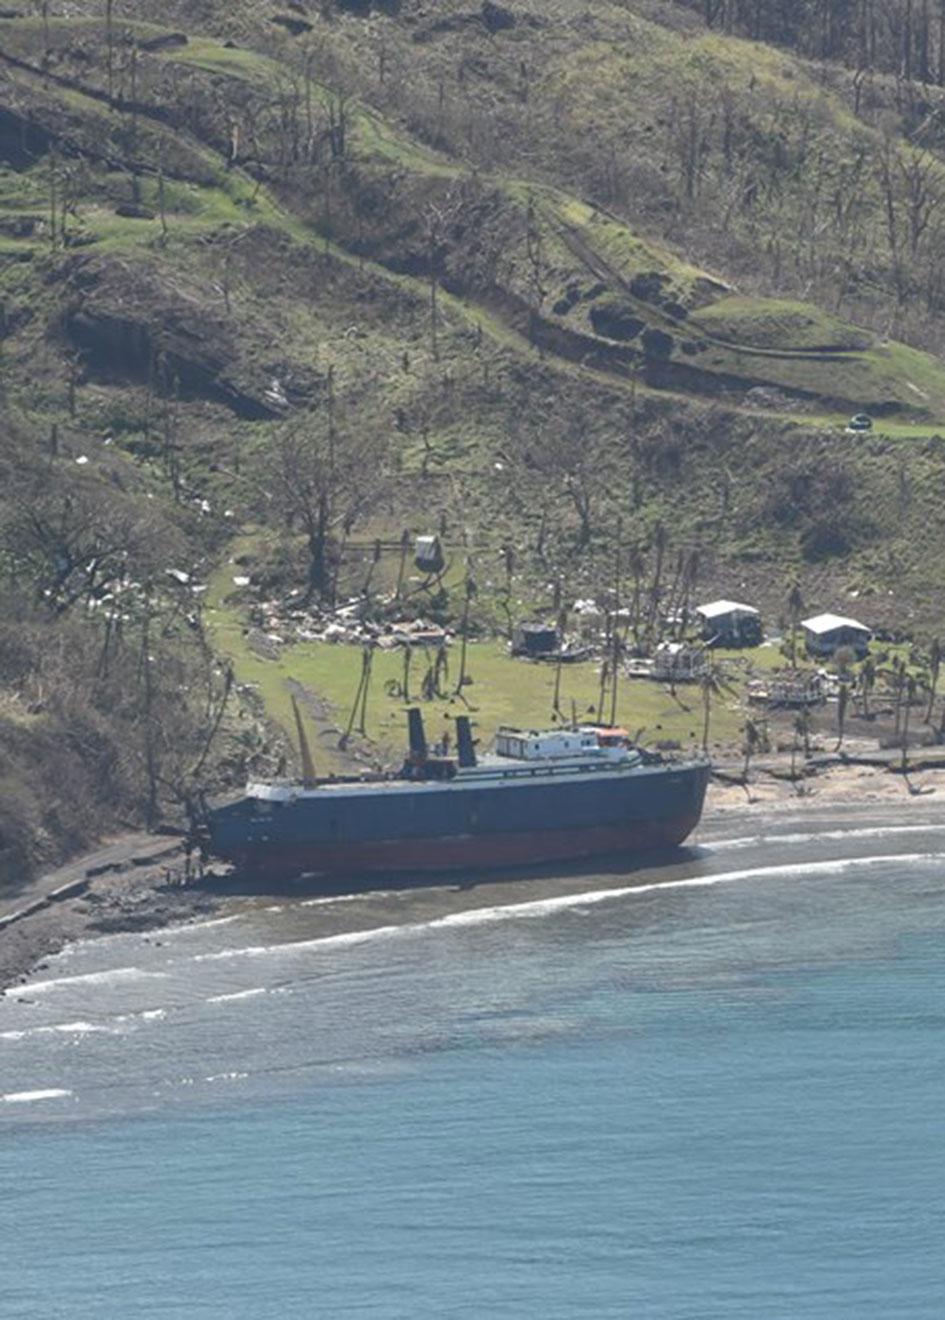 Ship on the beach in Fiji